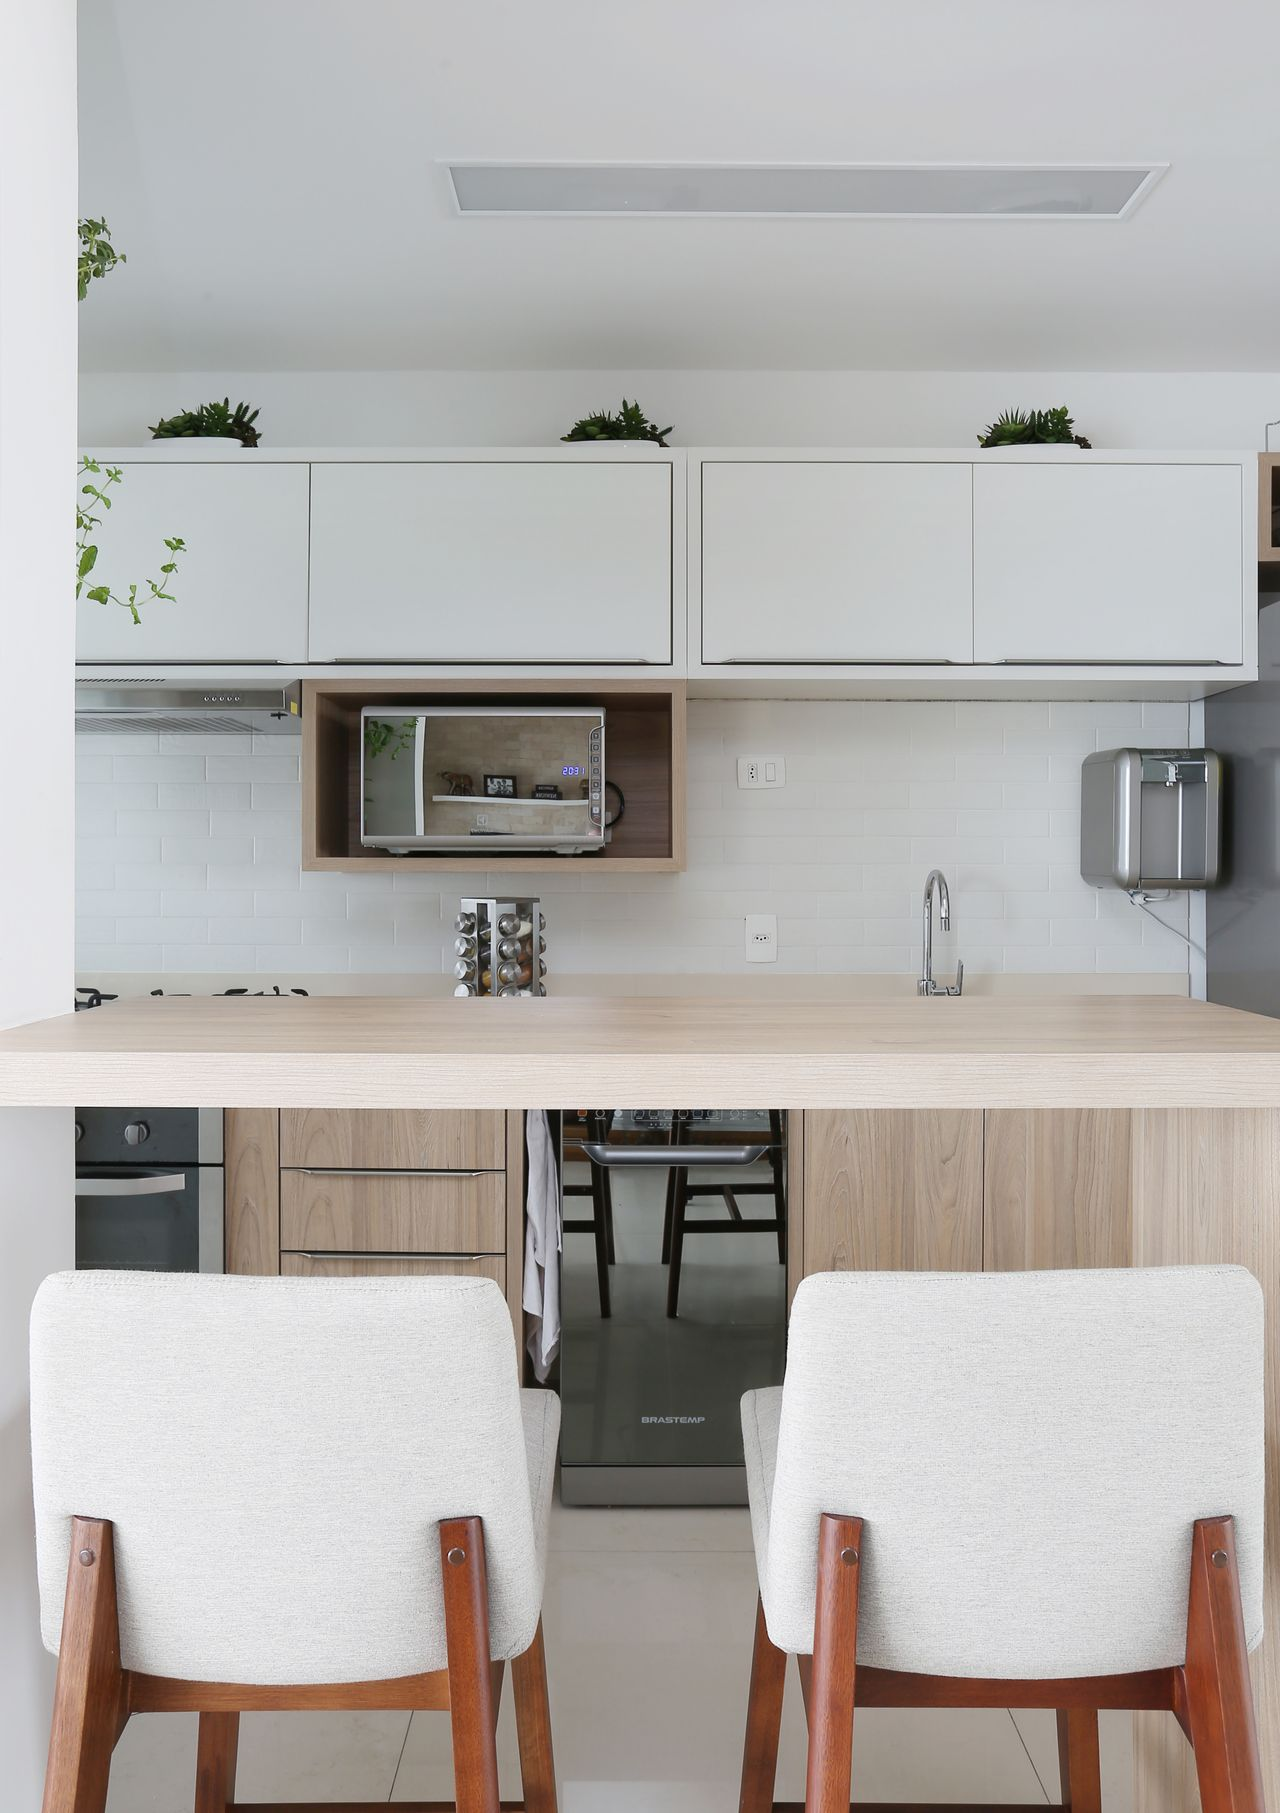 Cozinha Clean De Renata C Faro 164407 No Viva Decora